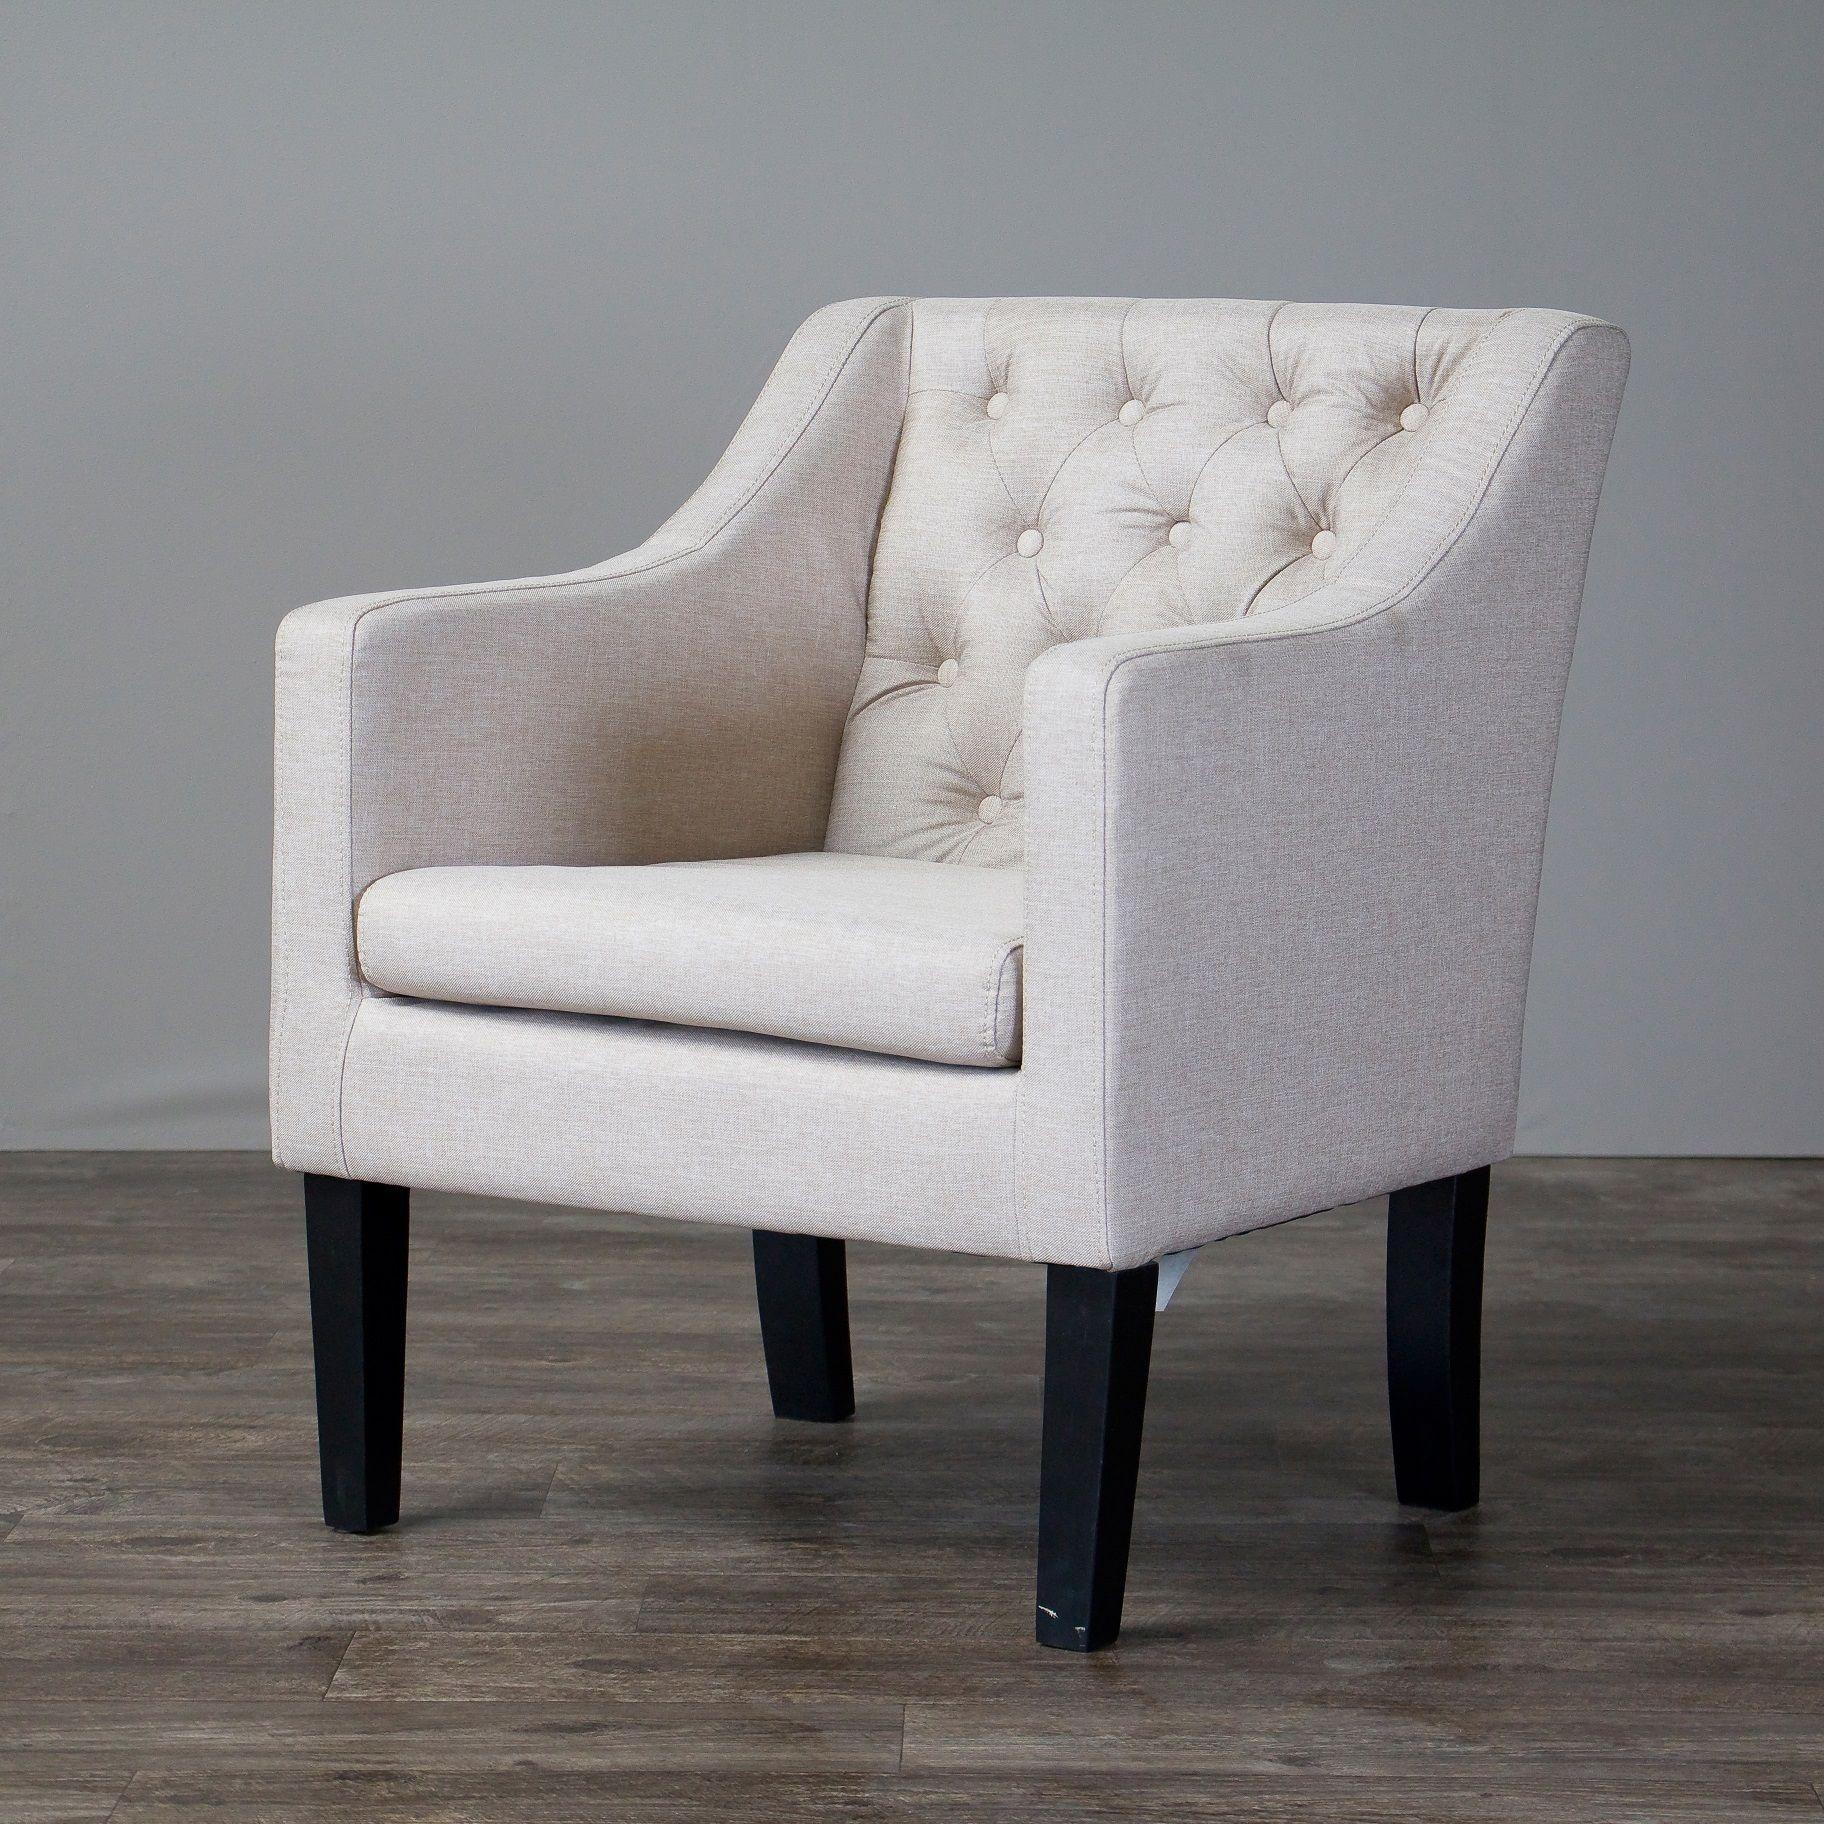 Prime Laurel Creek Larkin Upholstered Button Tufted Modern Club Gamerscity Chair Design For Home Gamerscityorg